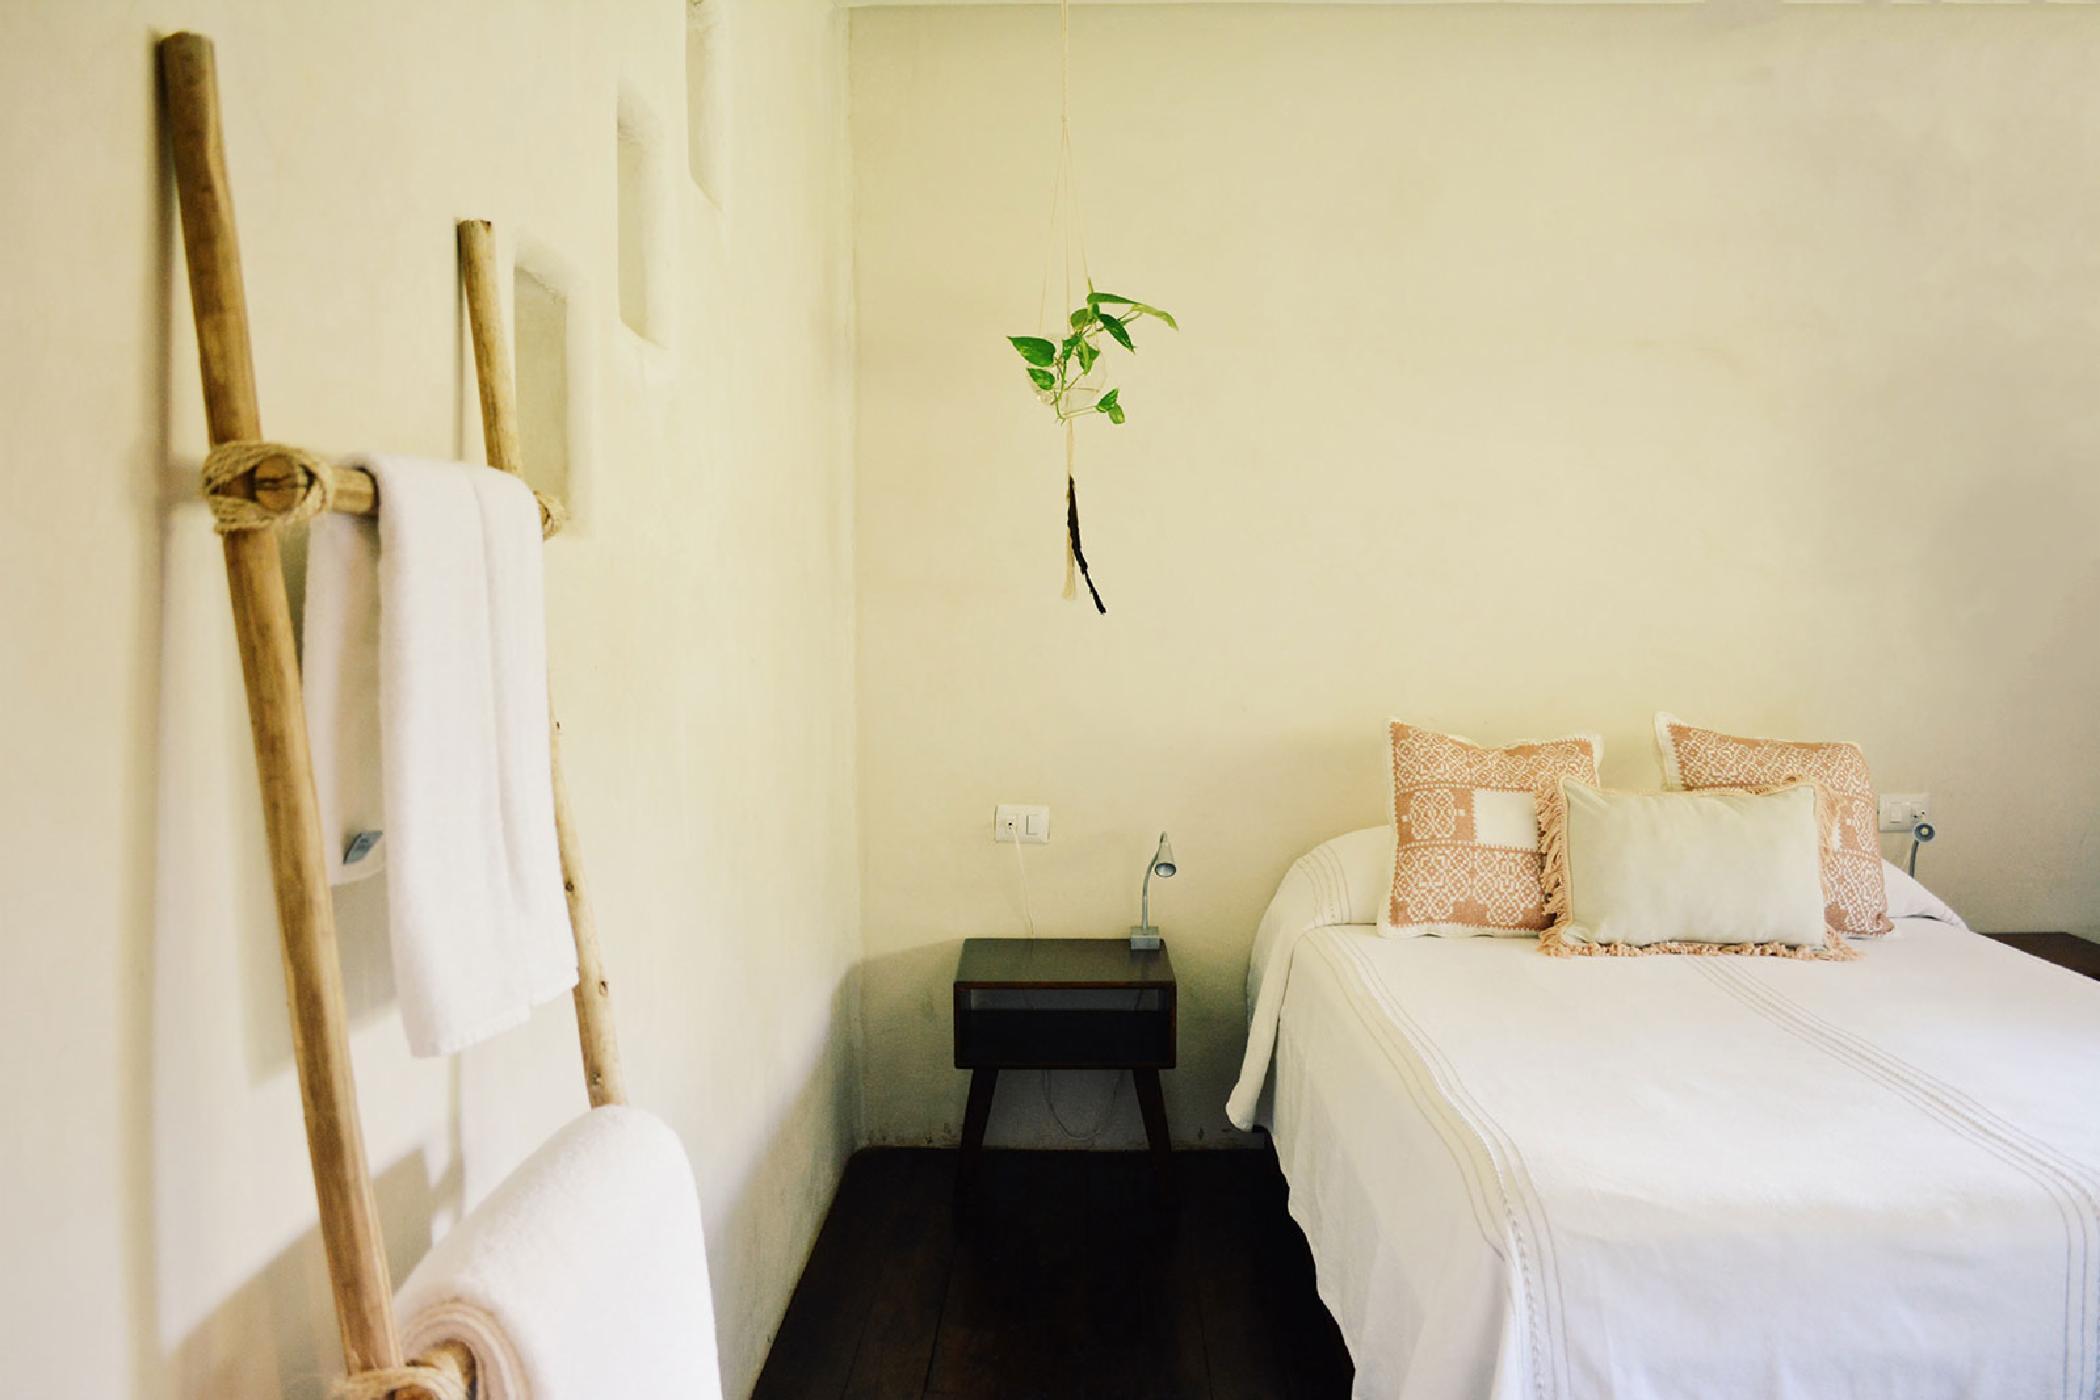 Maya_Luxe_Riviera_Maya_Luxury_Villas_Experiences_Hotel_Zone_Tulum_Beach_5_Bedrooms_Casa_Palapa_17.jpg